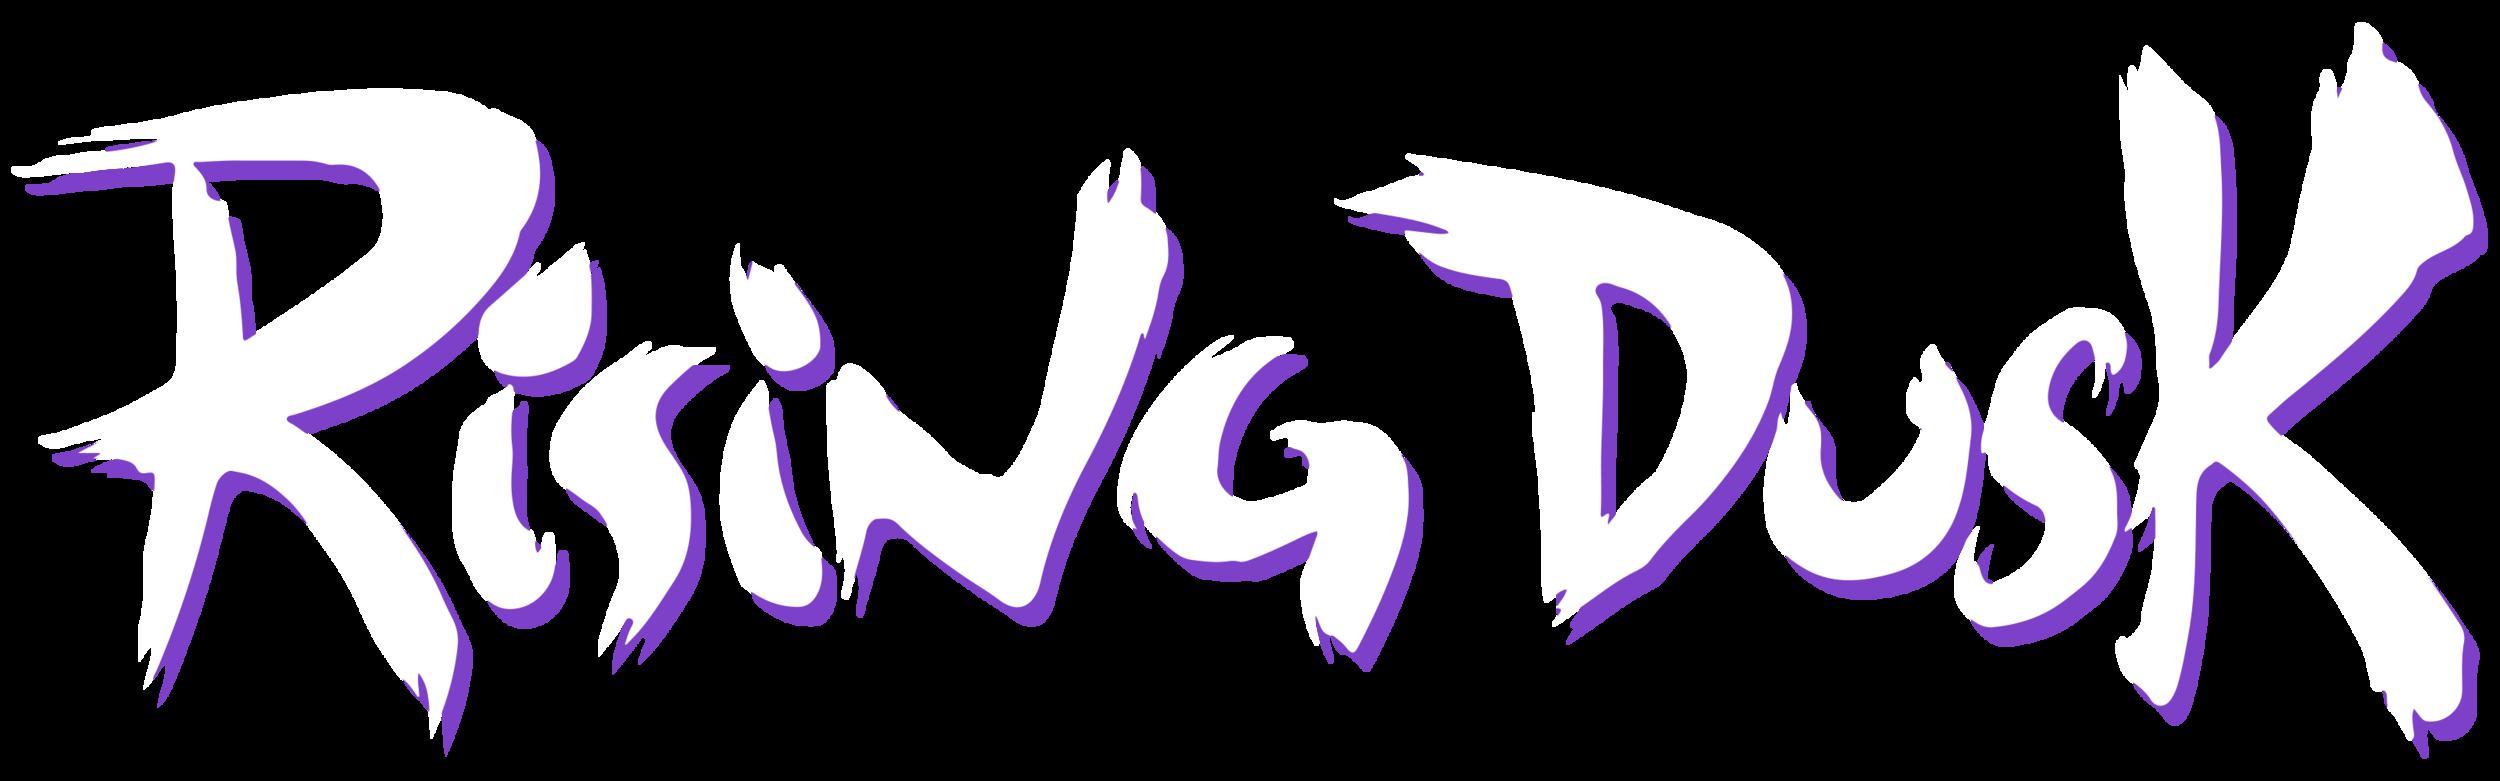 RisingDusk-Logo-Light-Short-HighRes.png